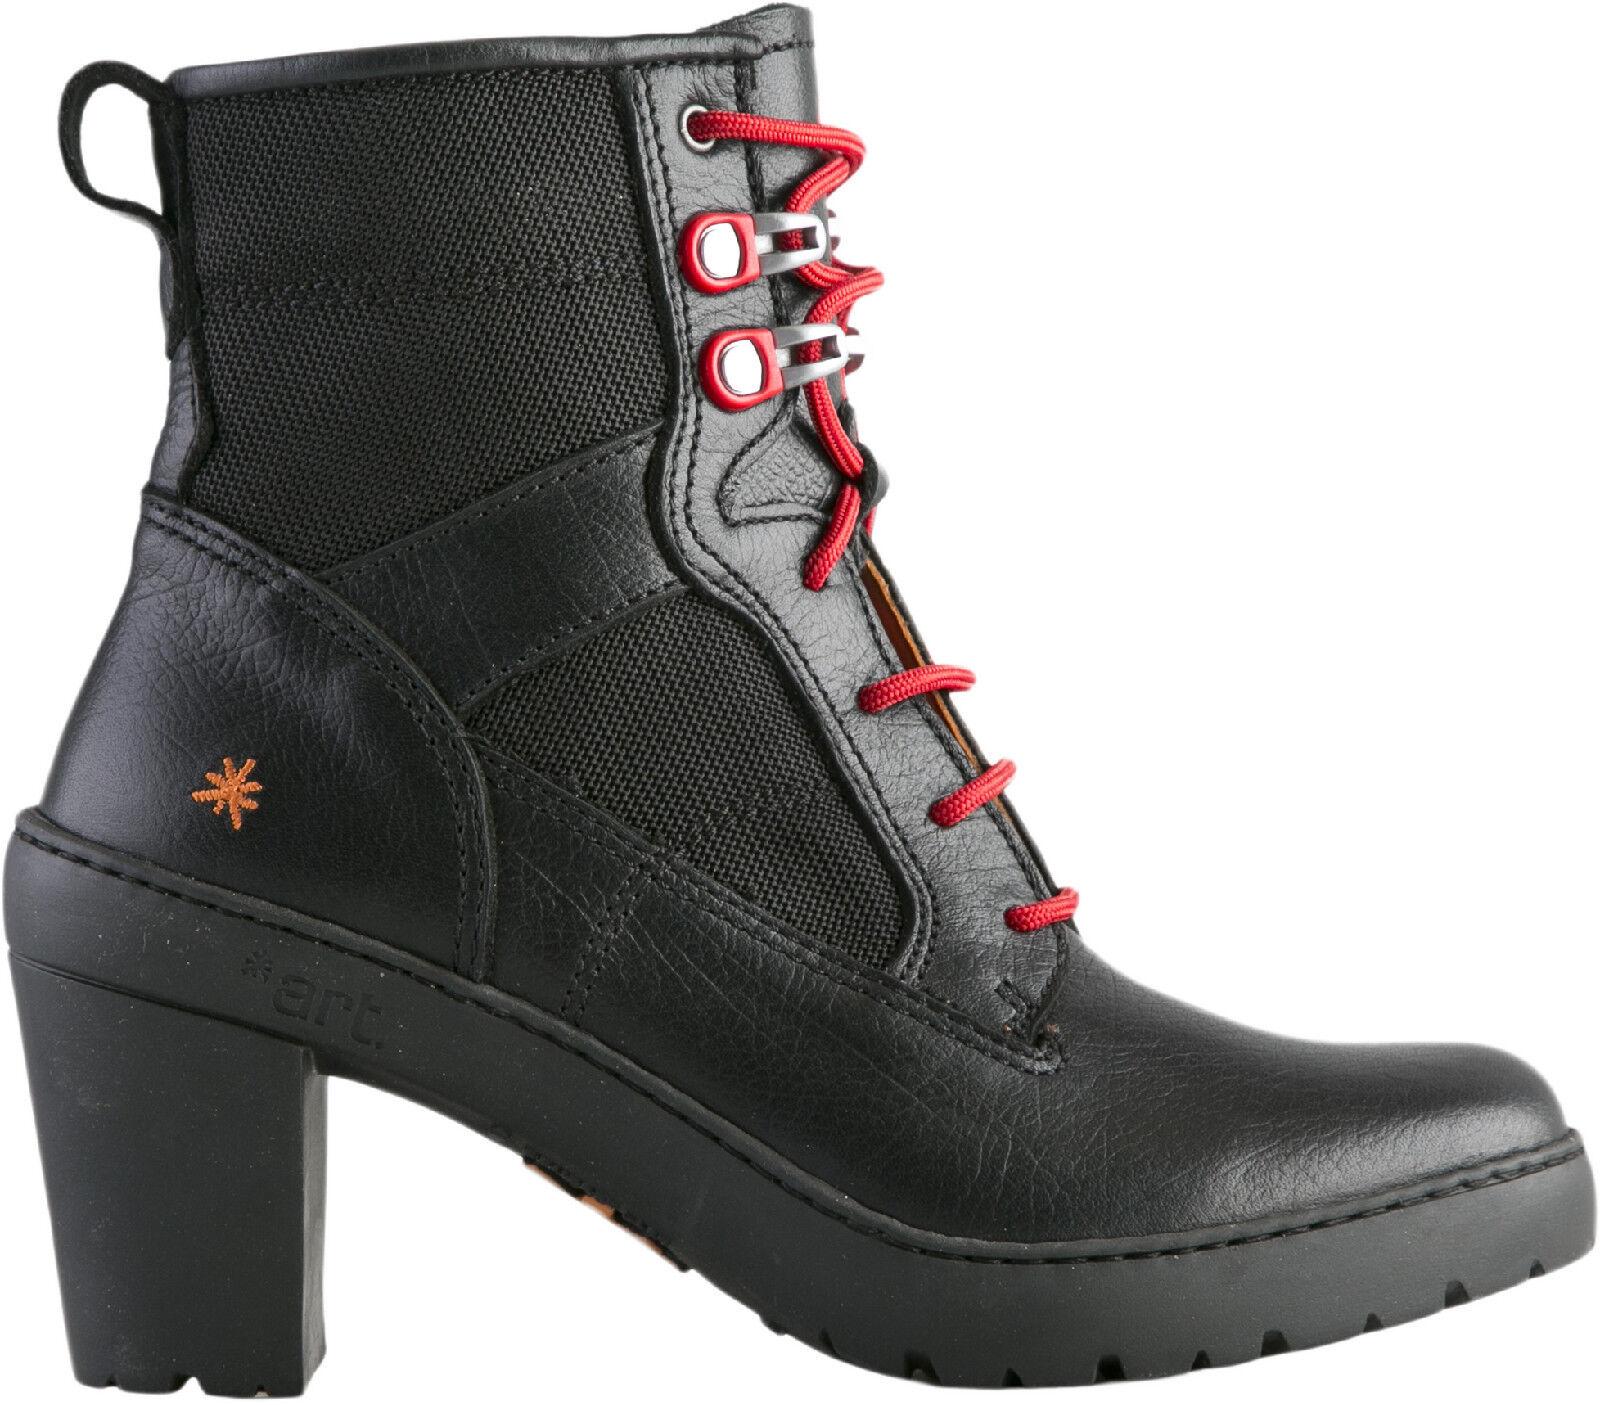 The The The Art Company párrafo botines botas zapatos 0356 techno  Envío y cambio gratis.